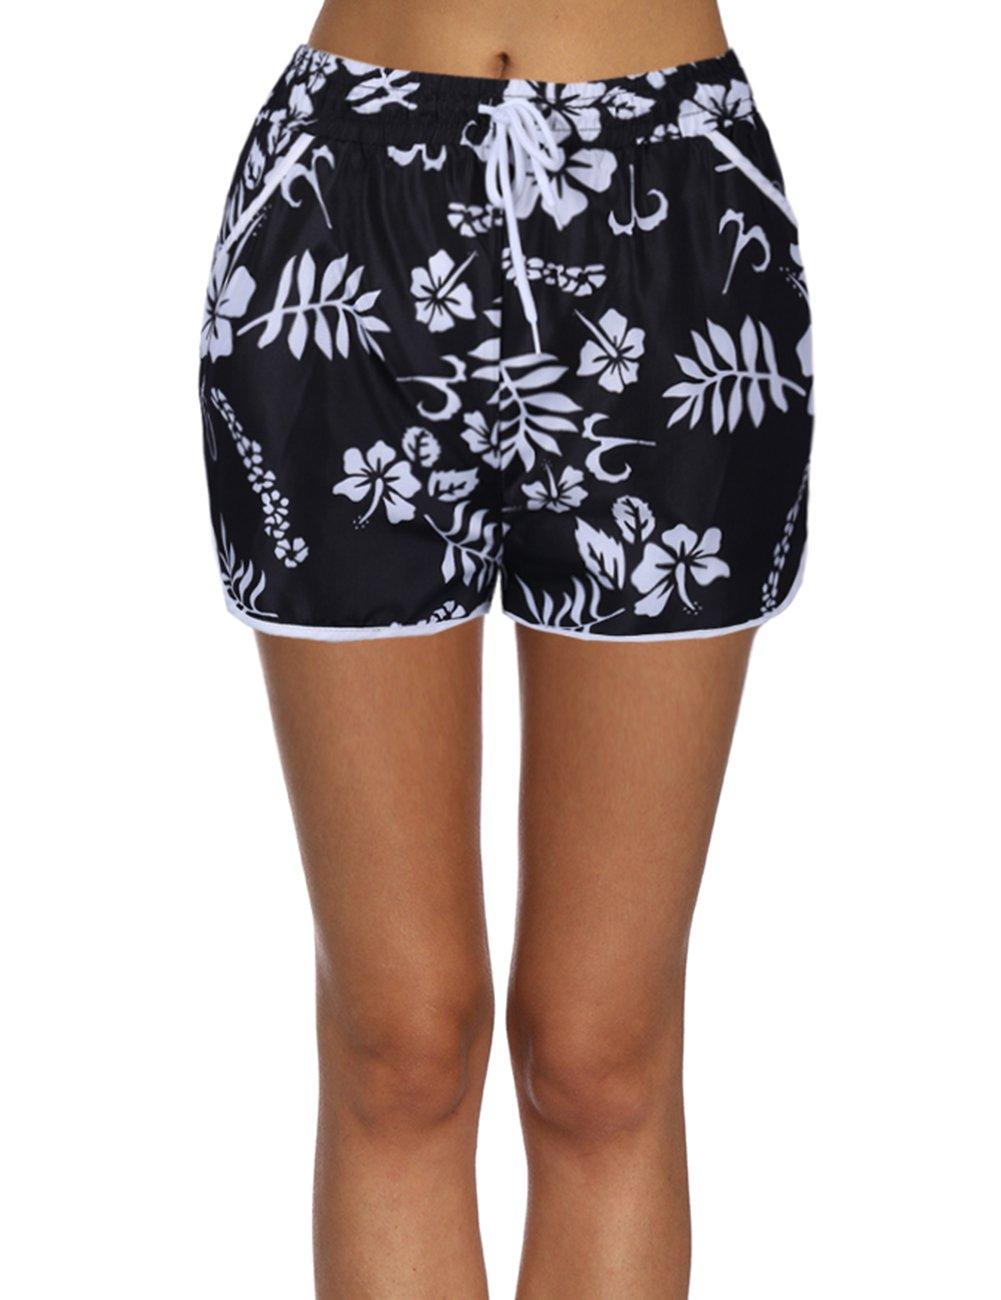 Yeleo Trosetry Women's Floral Flower Print Casual Beach Shorts Adjustable Drawstring Boy Style Board Swim Shorts with Pockets